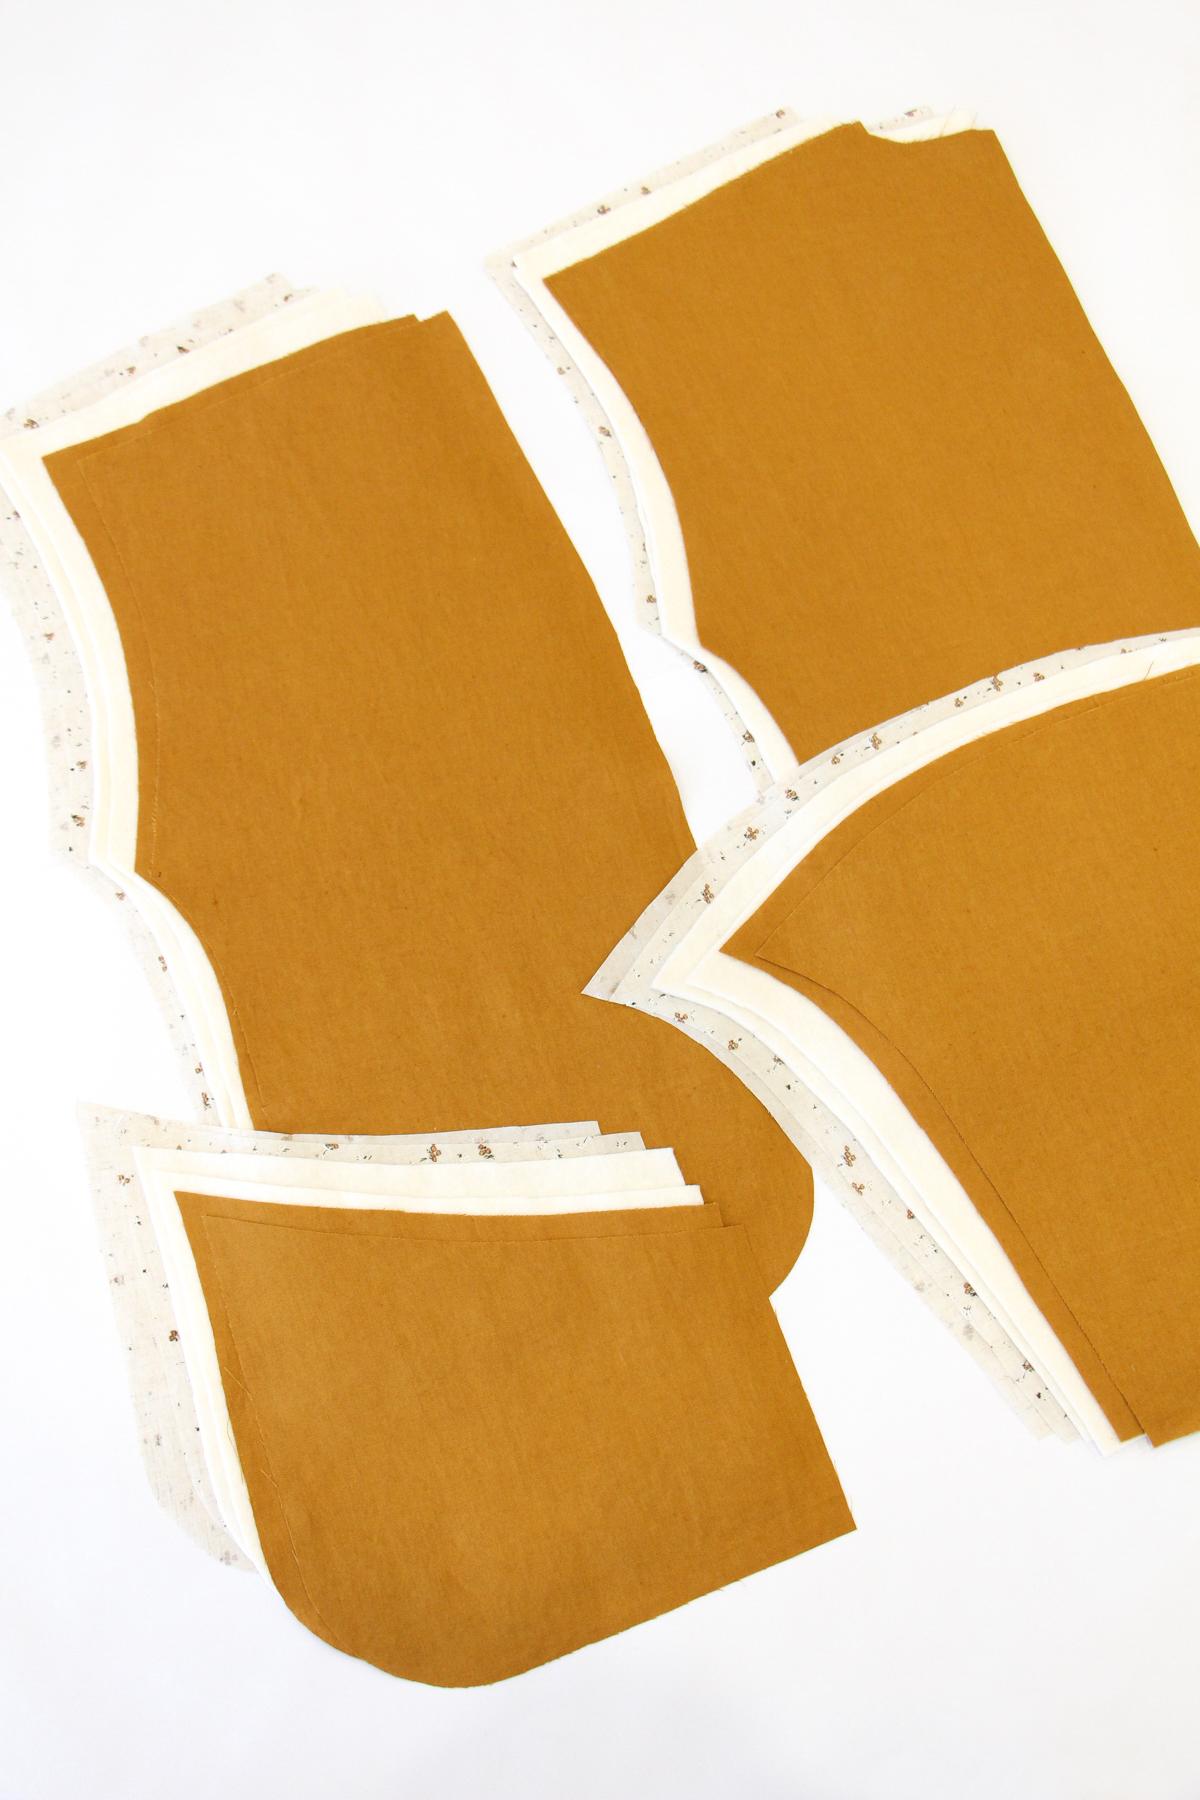 Megan Nielsen Patterns | Hovea Sewalong: Quilting Prep | Cutting Out Your Jacket Pieces